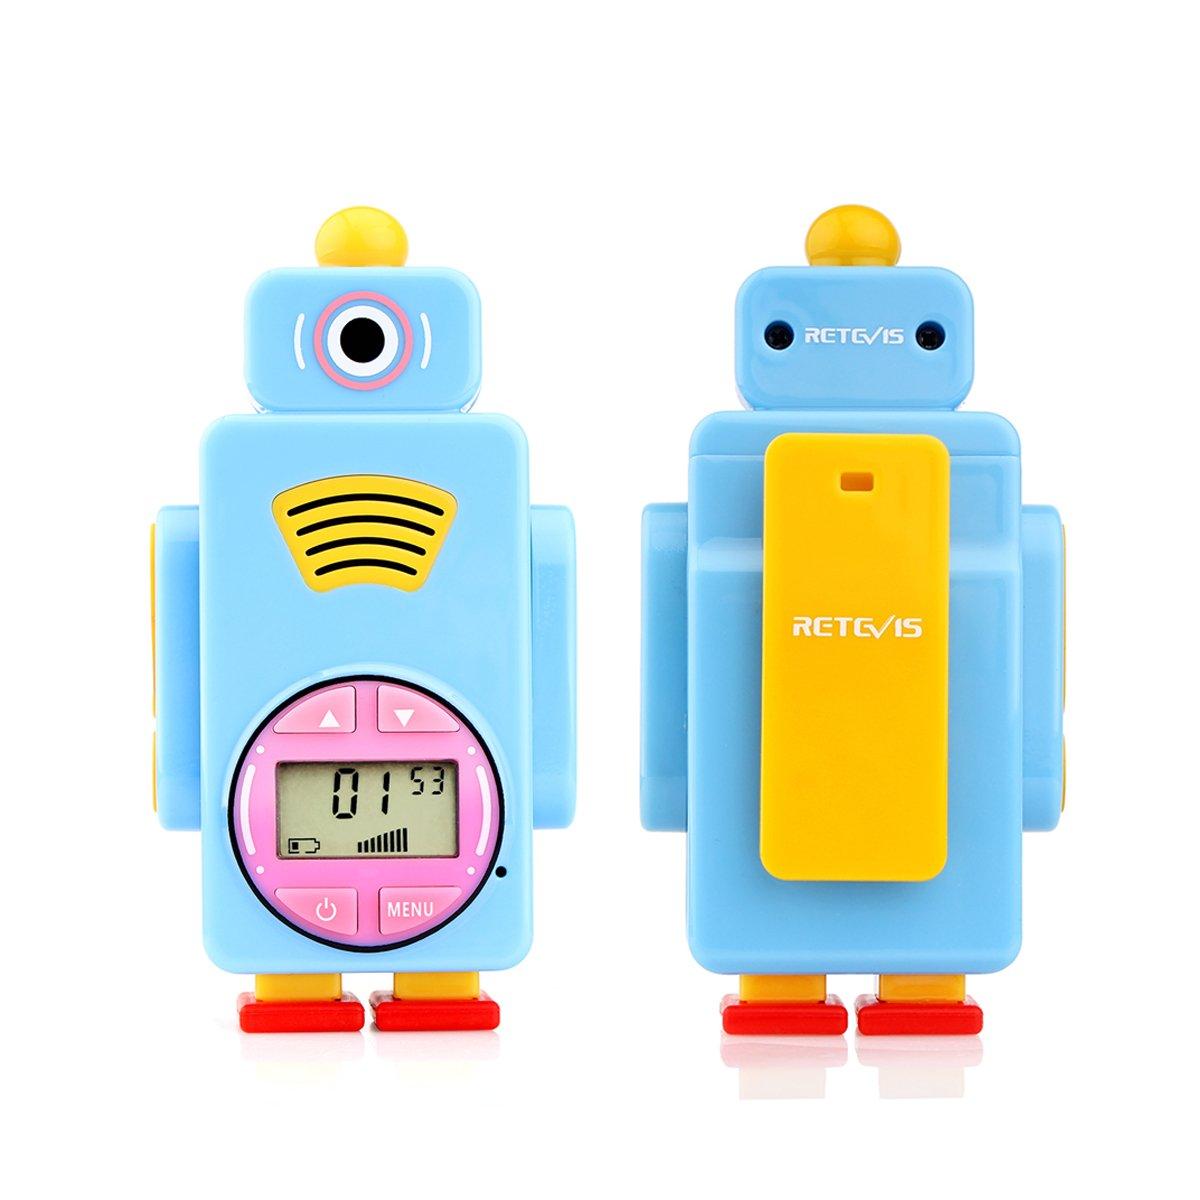 Retevis RT36 Kids Walkie Talkies Rechargeable Battery USB Charging Flashlight Long Range Crystal Sound License Free Walkie Talkies for Kids (Blue,2 Pack) by Retevis (Image #4)